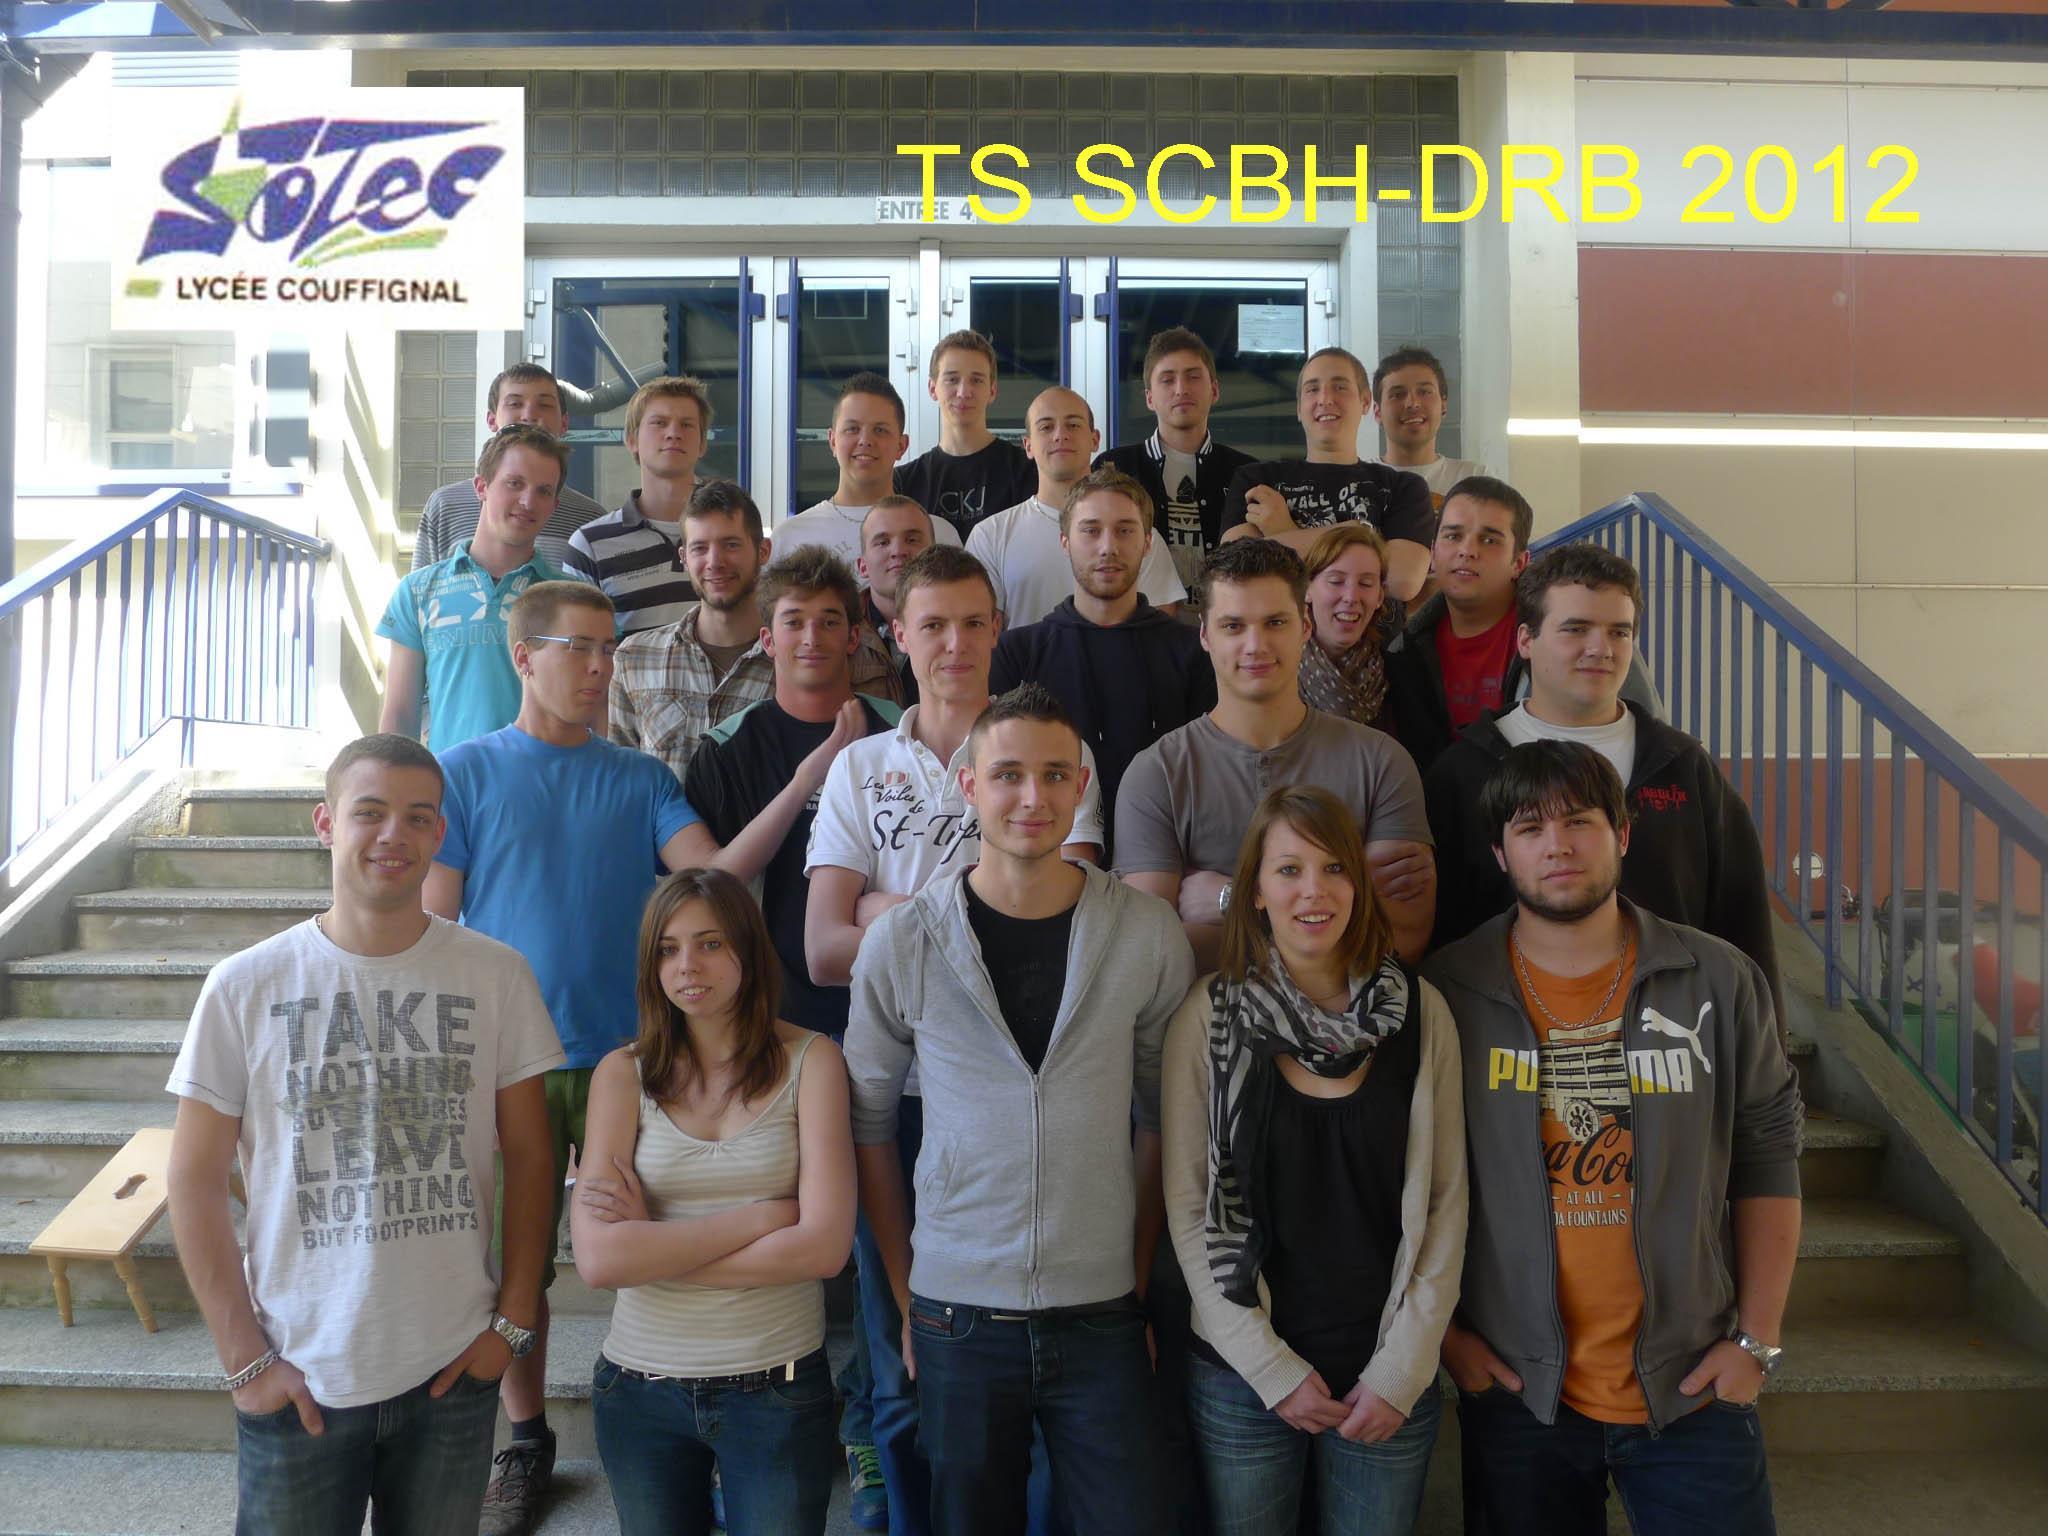 SCBH_DRB.jpg